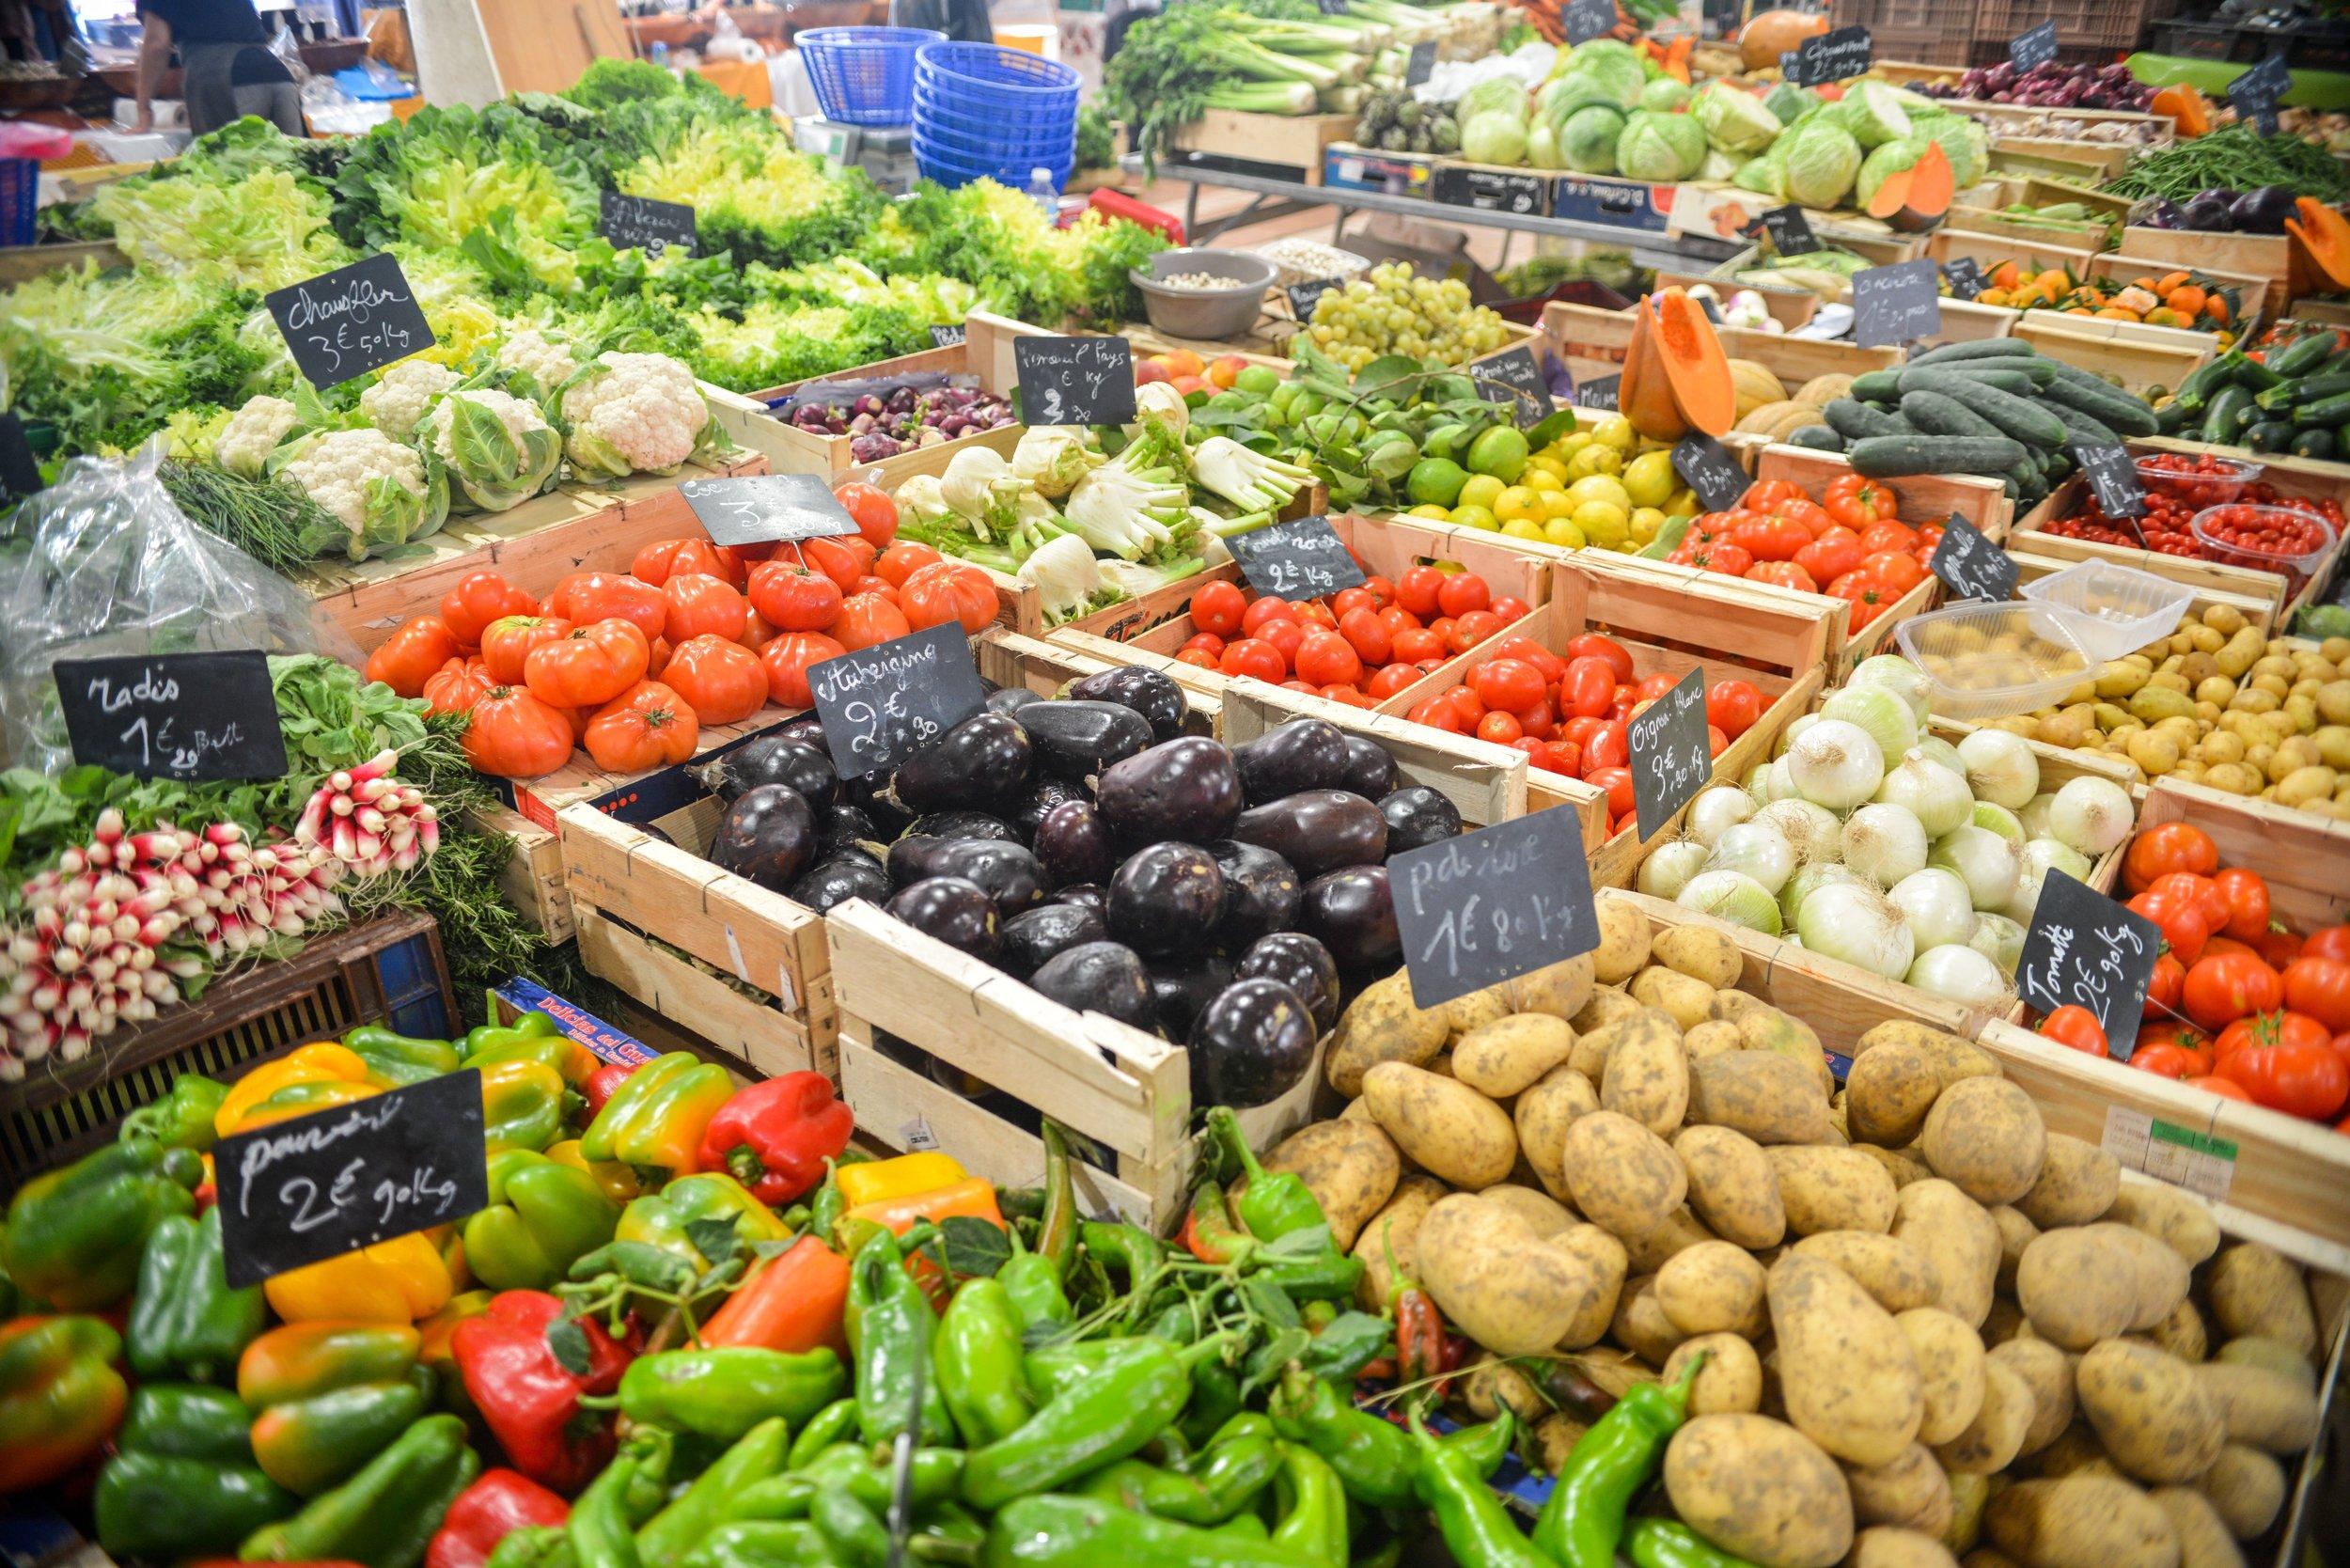 Eating nutrient dense foods is one of Dale's key health pillars